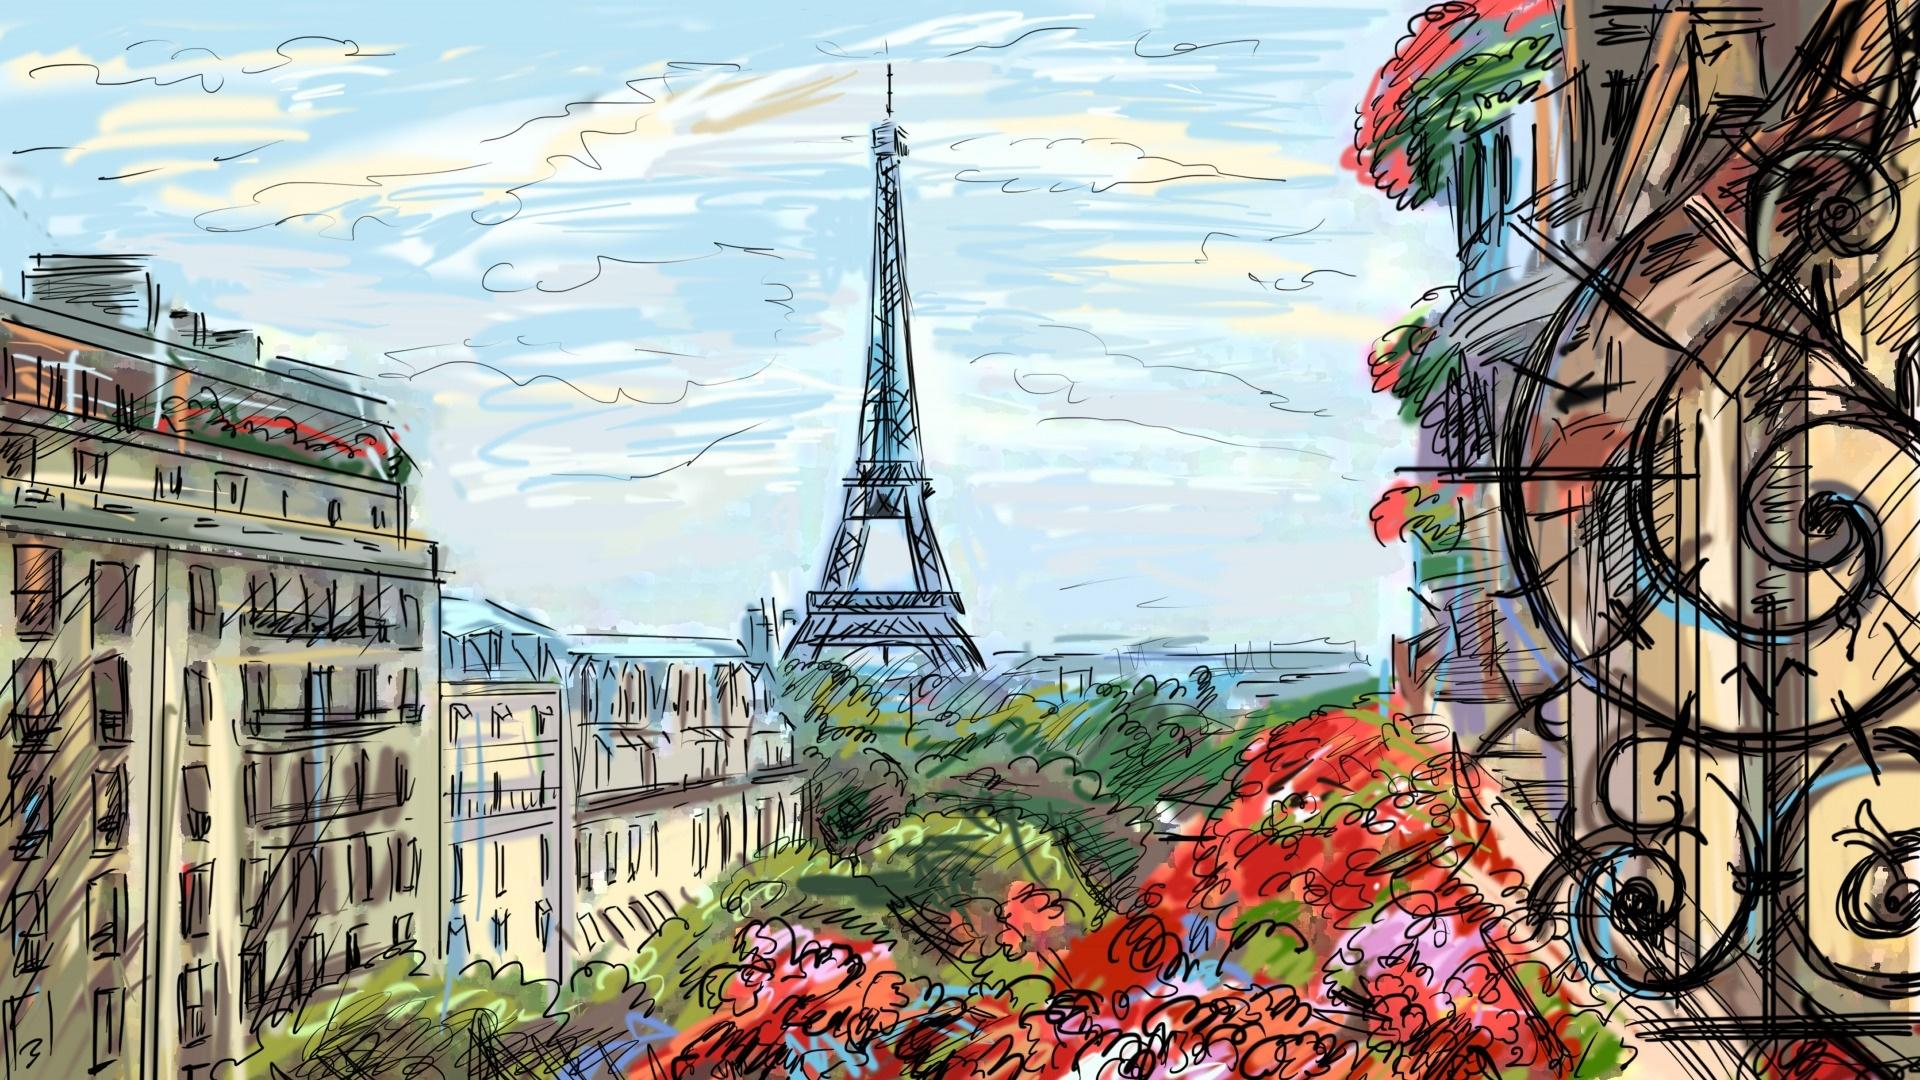 Eiffel Tower Art HD Wallpaper